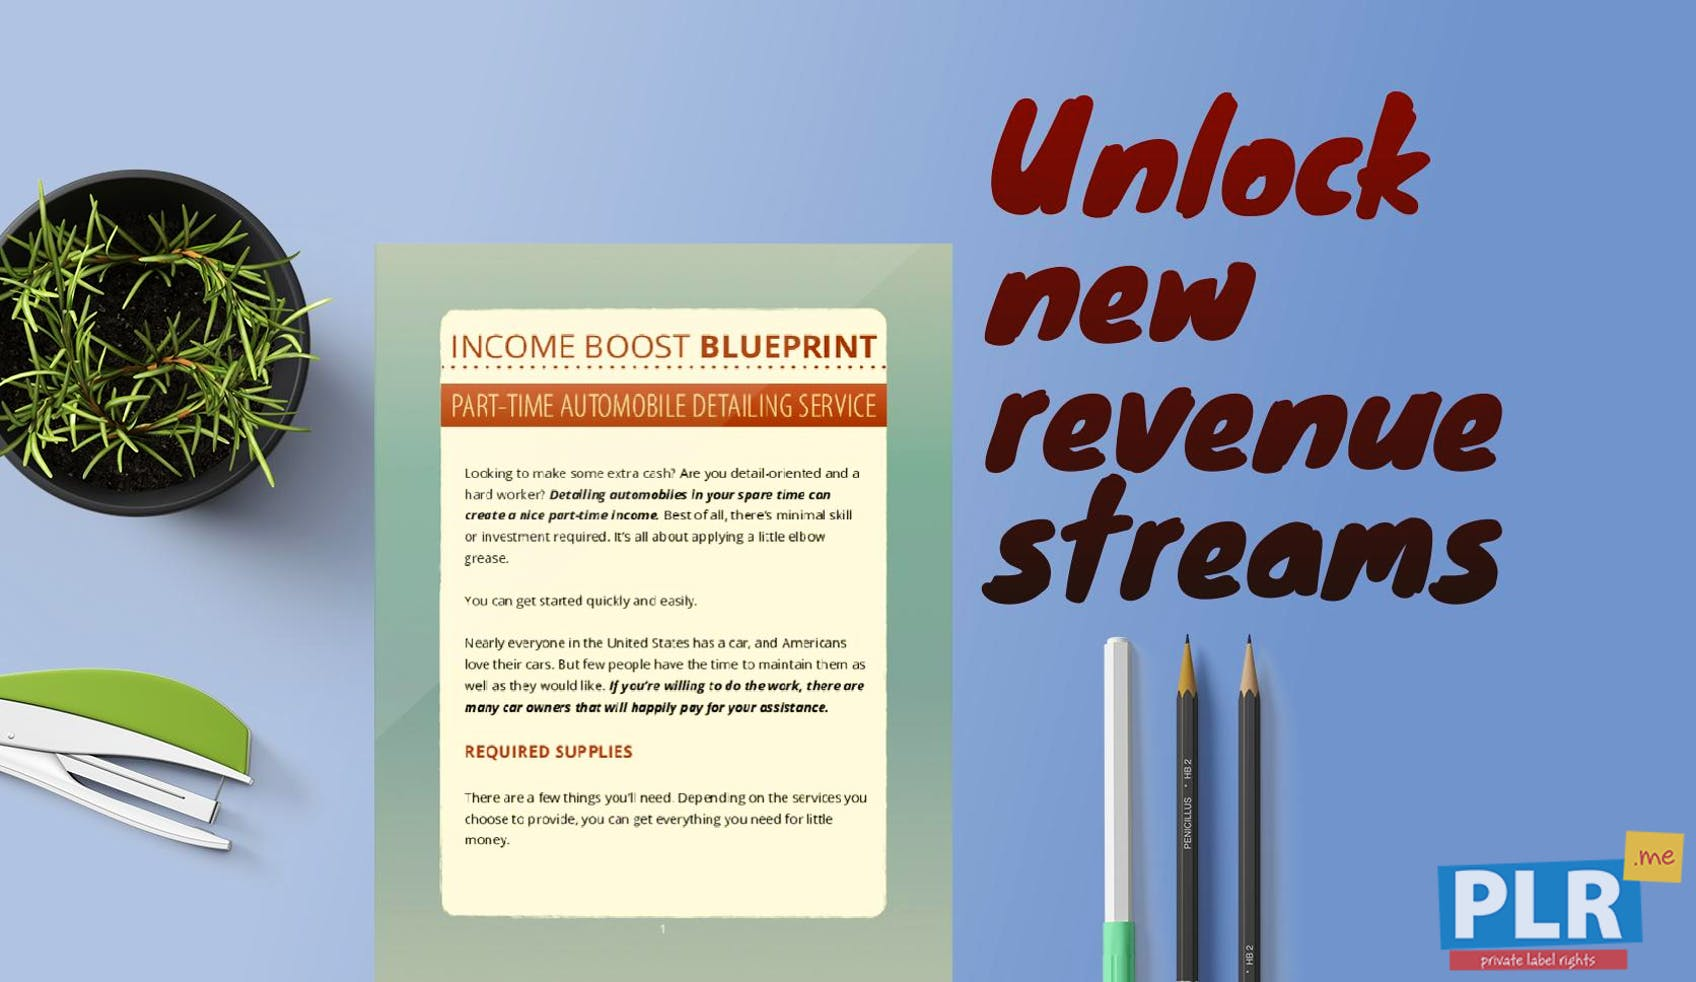 Income Boost Blueprint Automobile Detailing Service